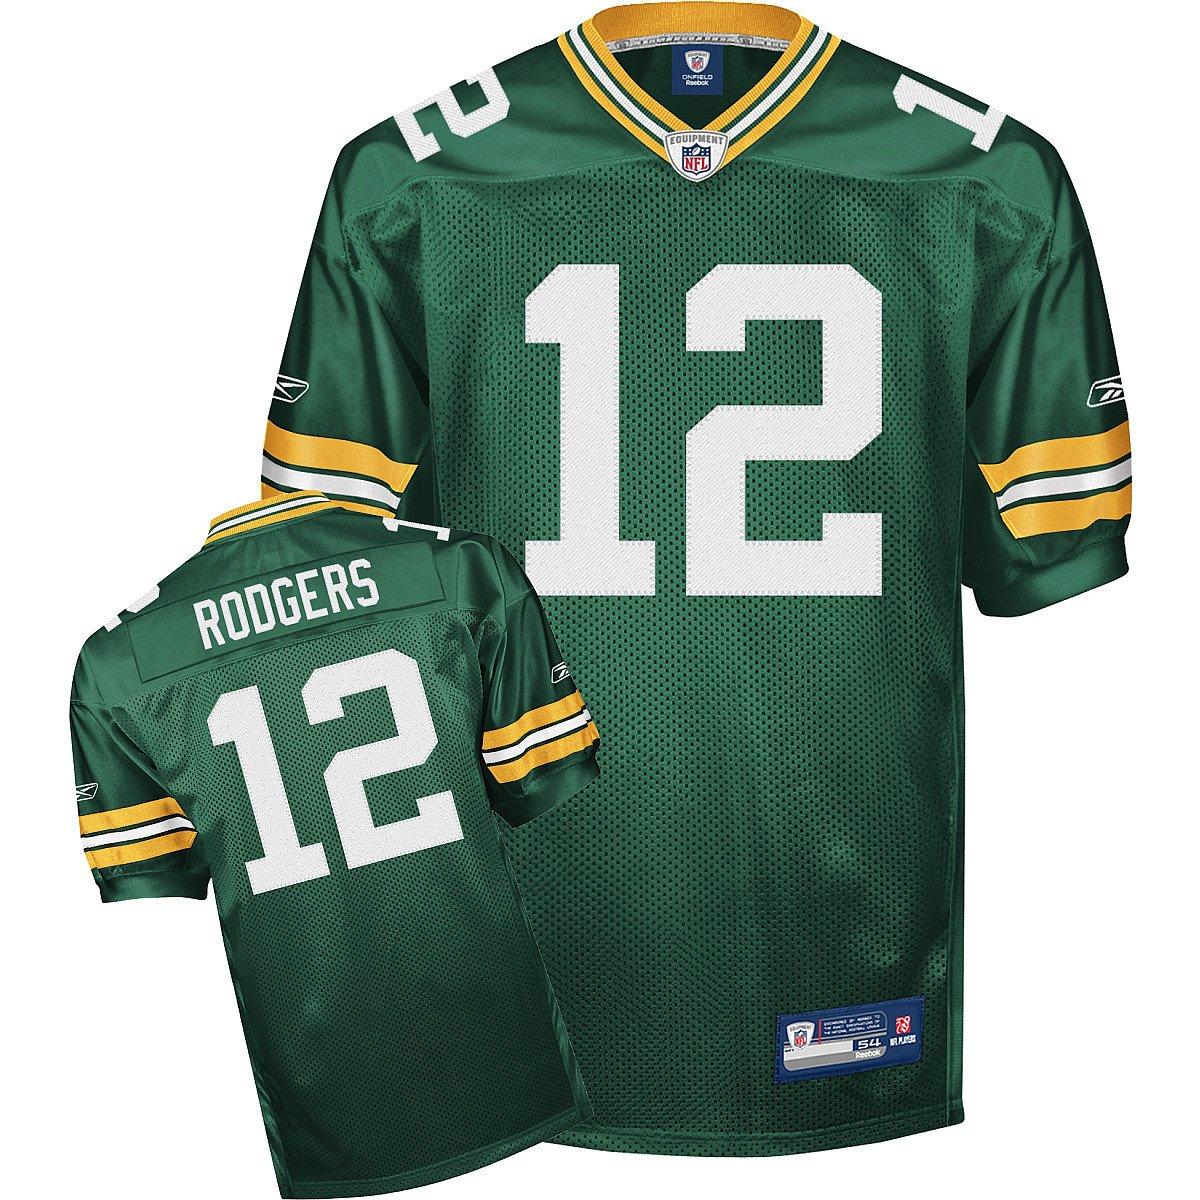 promo code 21668 98b37 Amazon.com : Reebok Green Bay Packers Aaron Rodgers ...